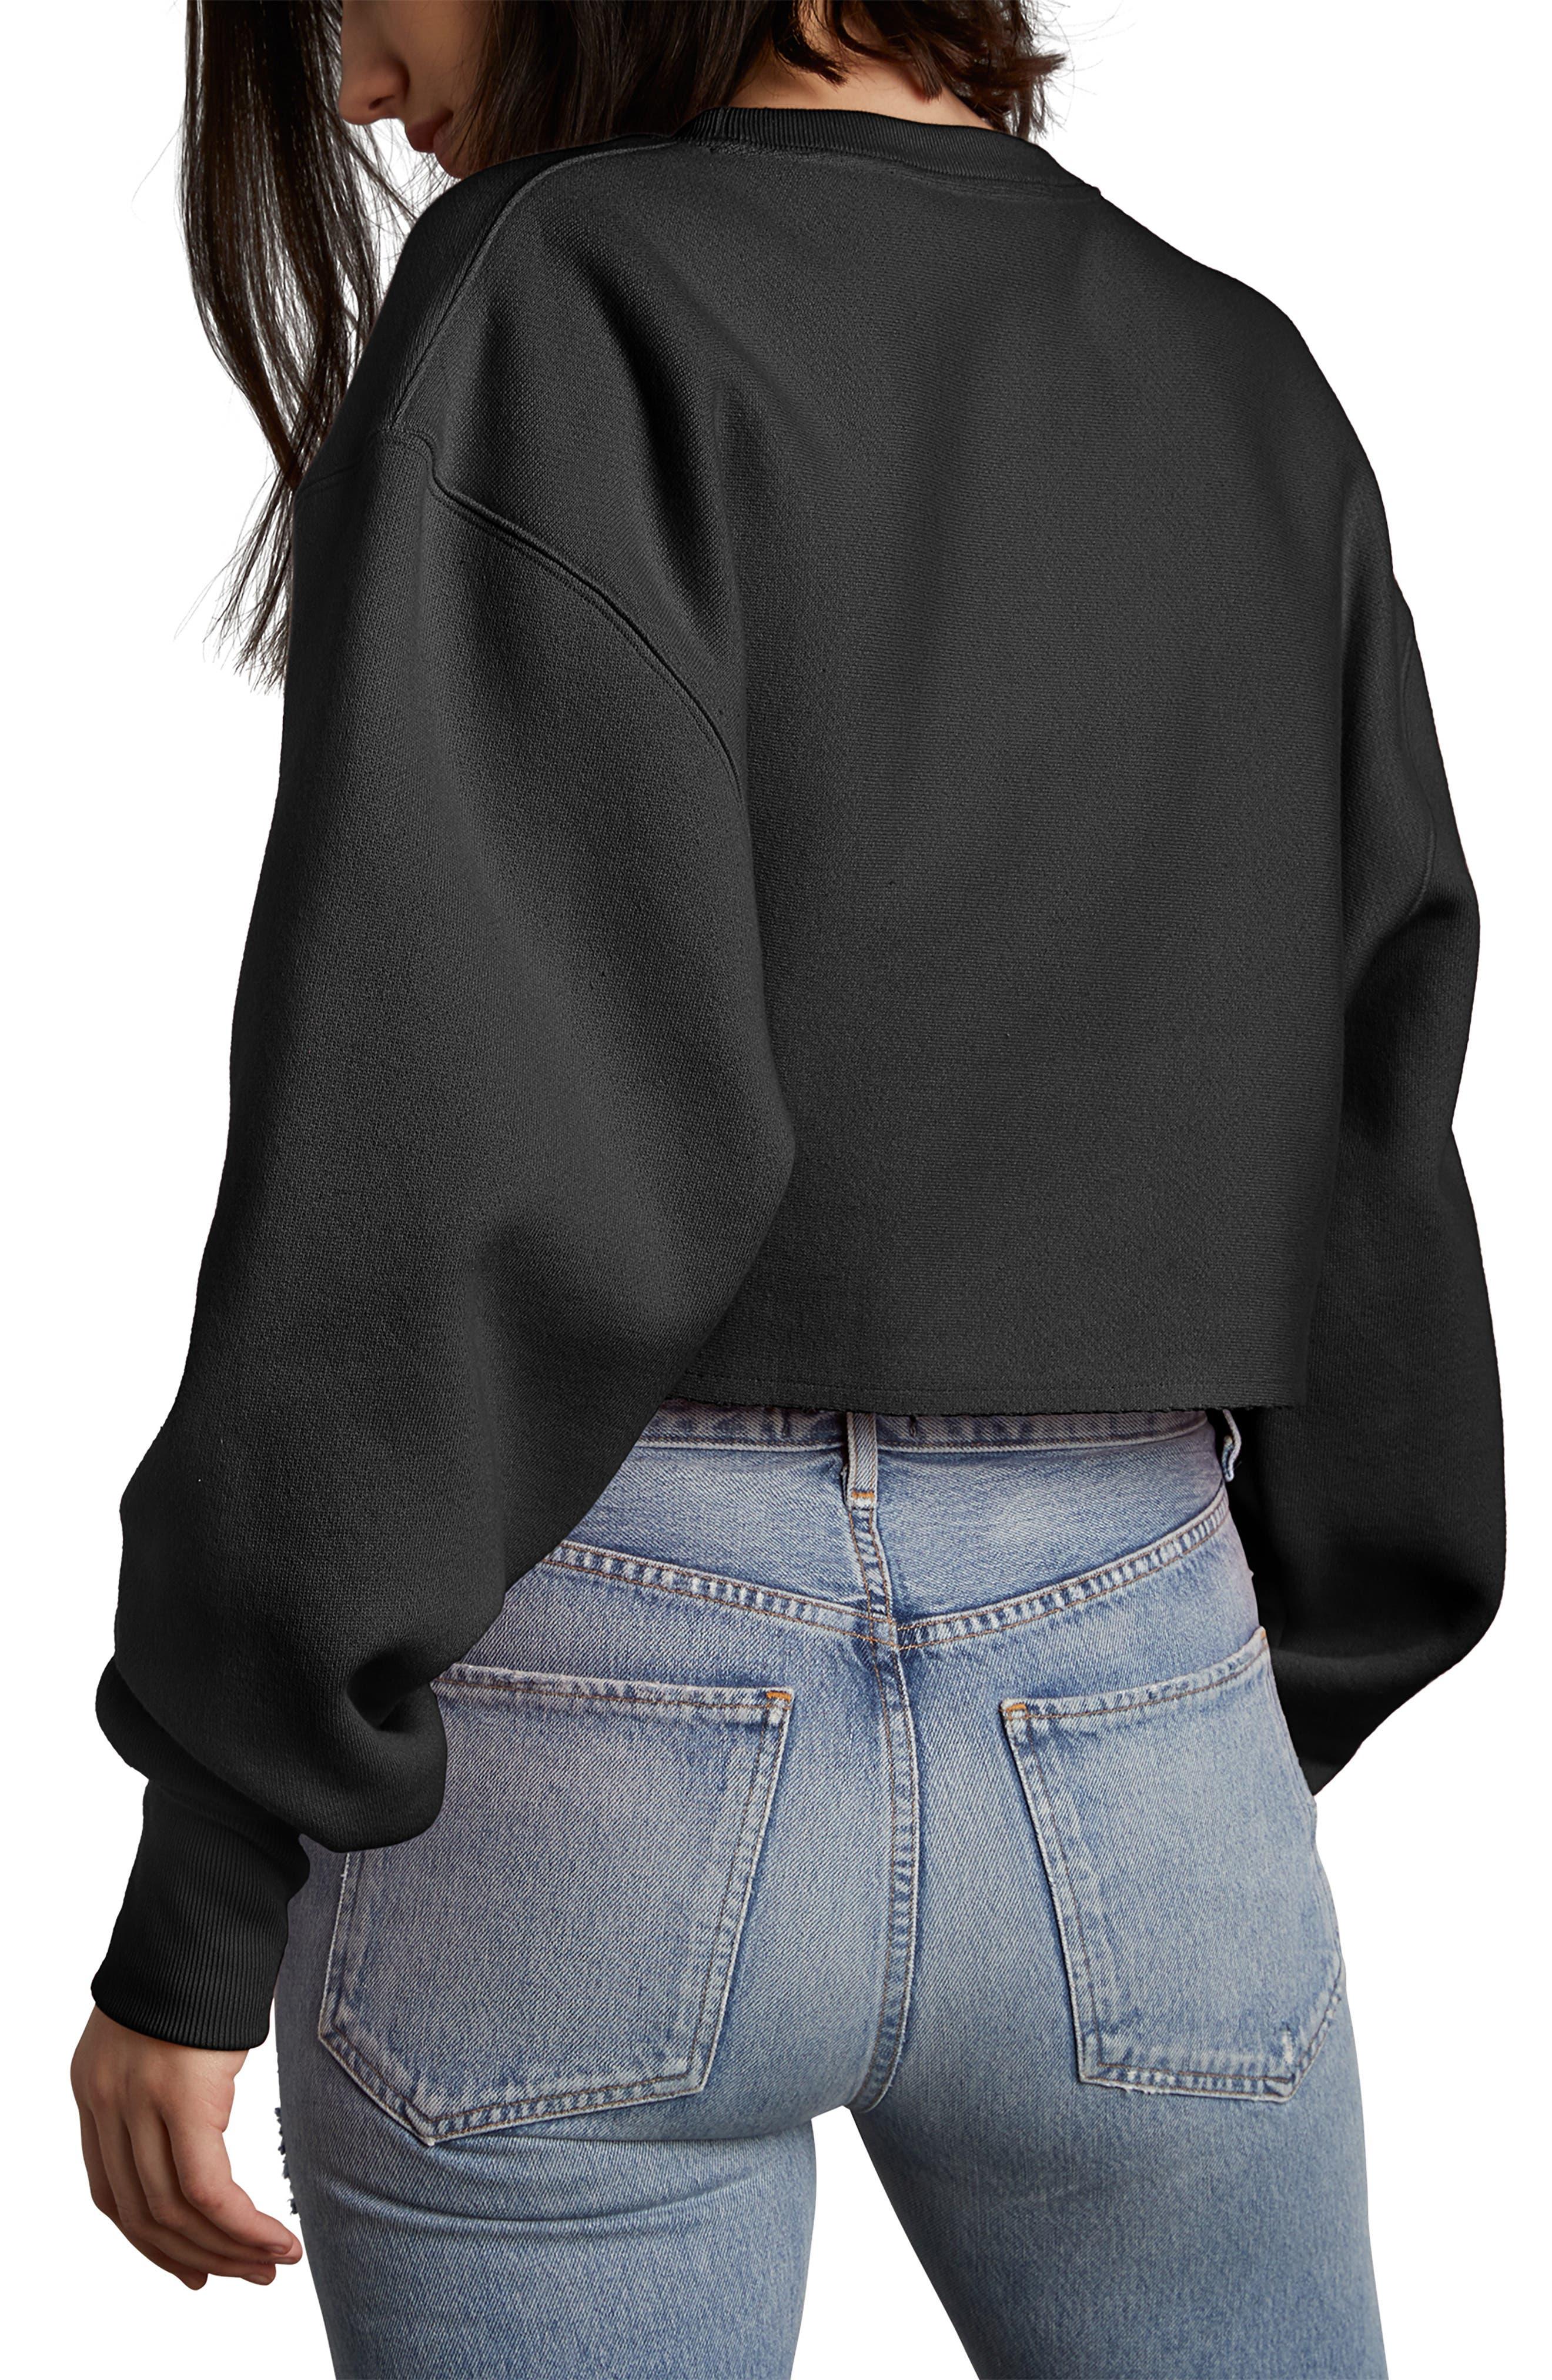 CHAMPION, Crop Reverse Weave Sweatshirt, Alternate thumbnail 2, color, BLACK